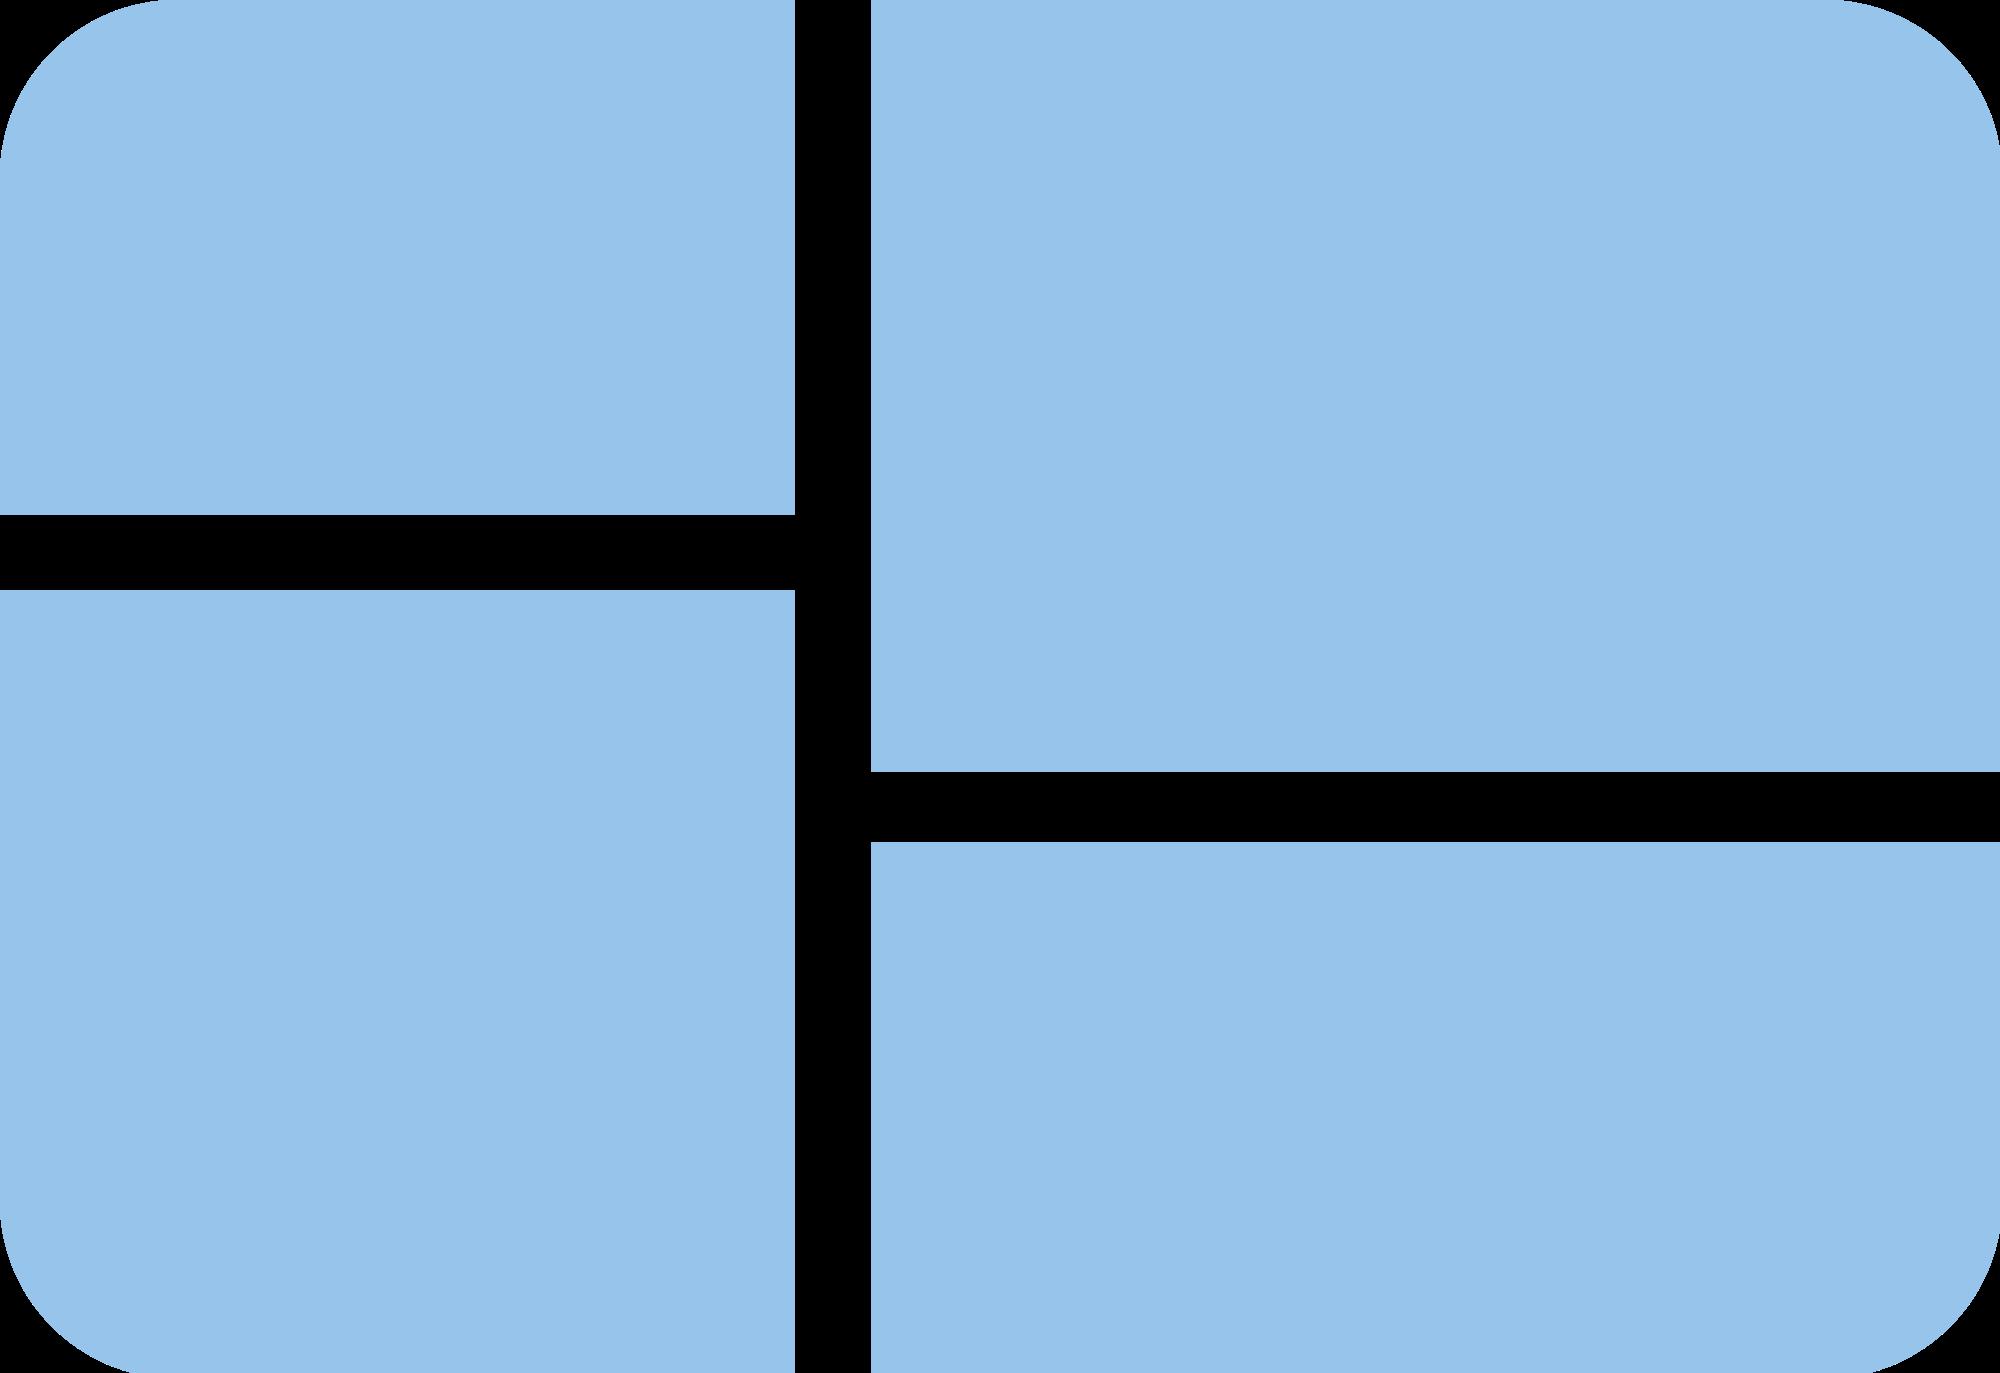 Svg to png windows. Image logo logopedia fandom